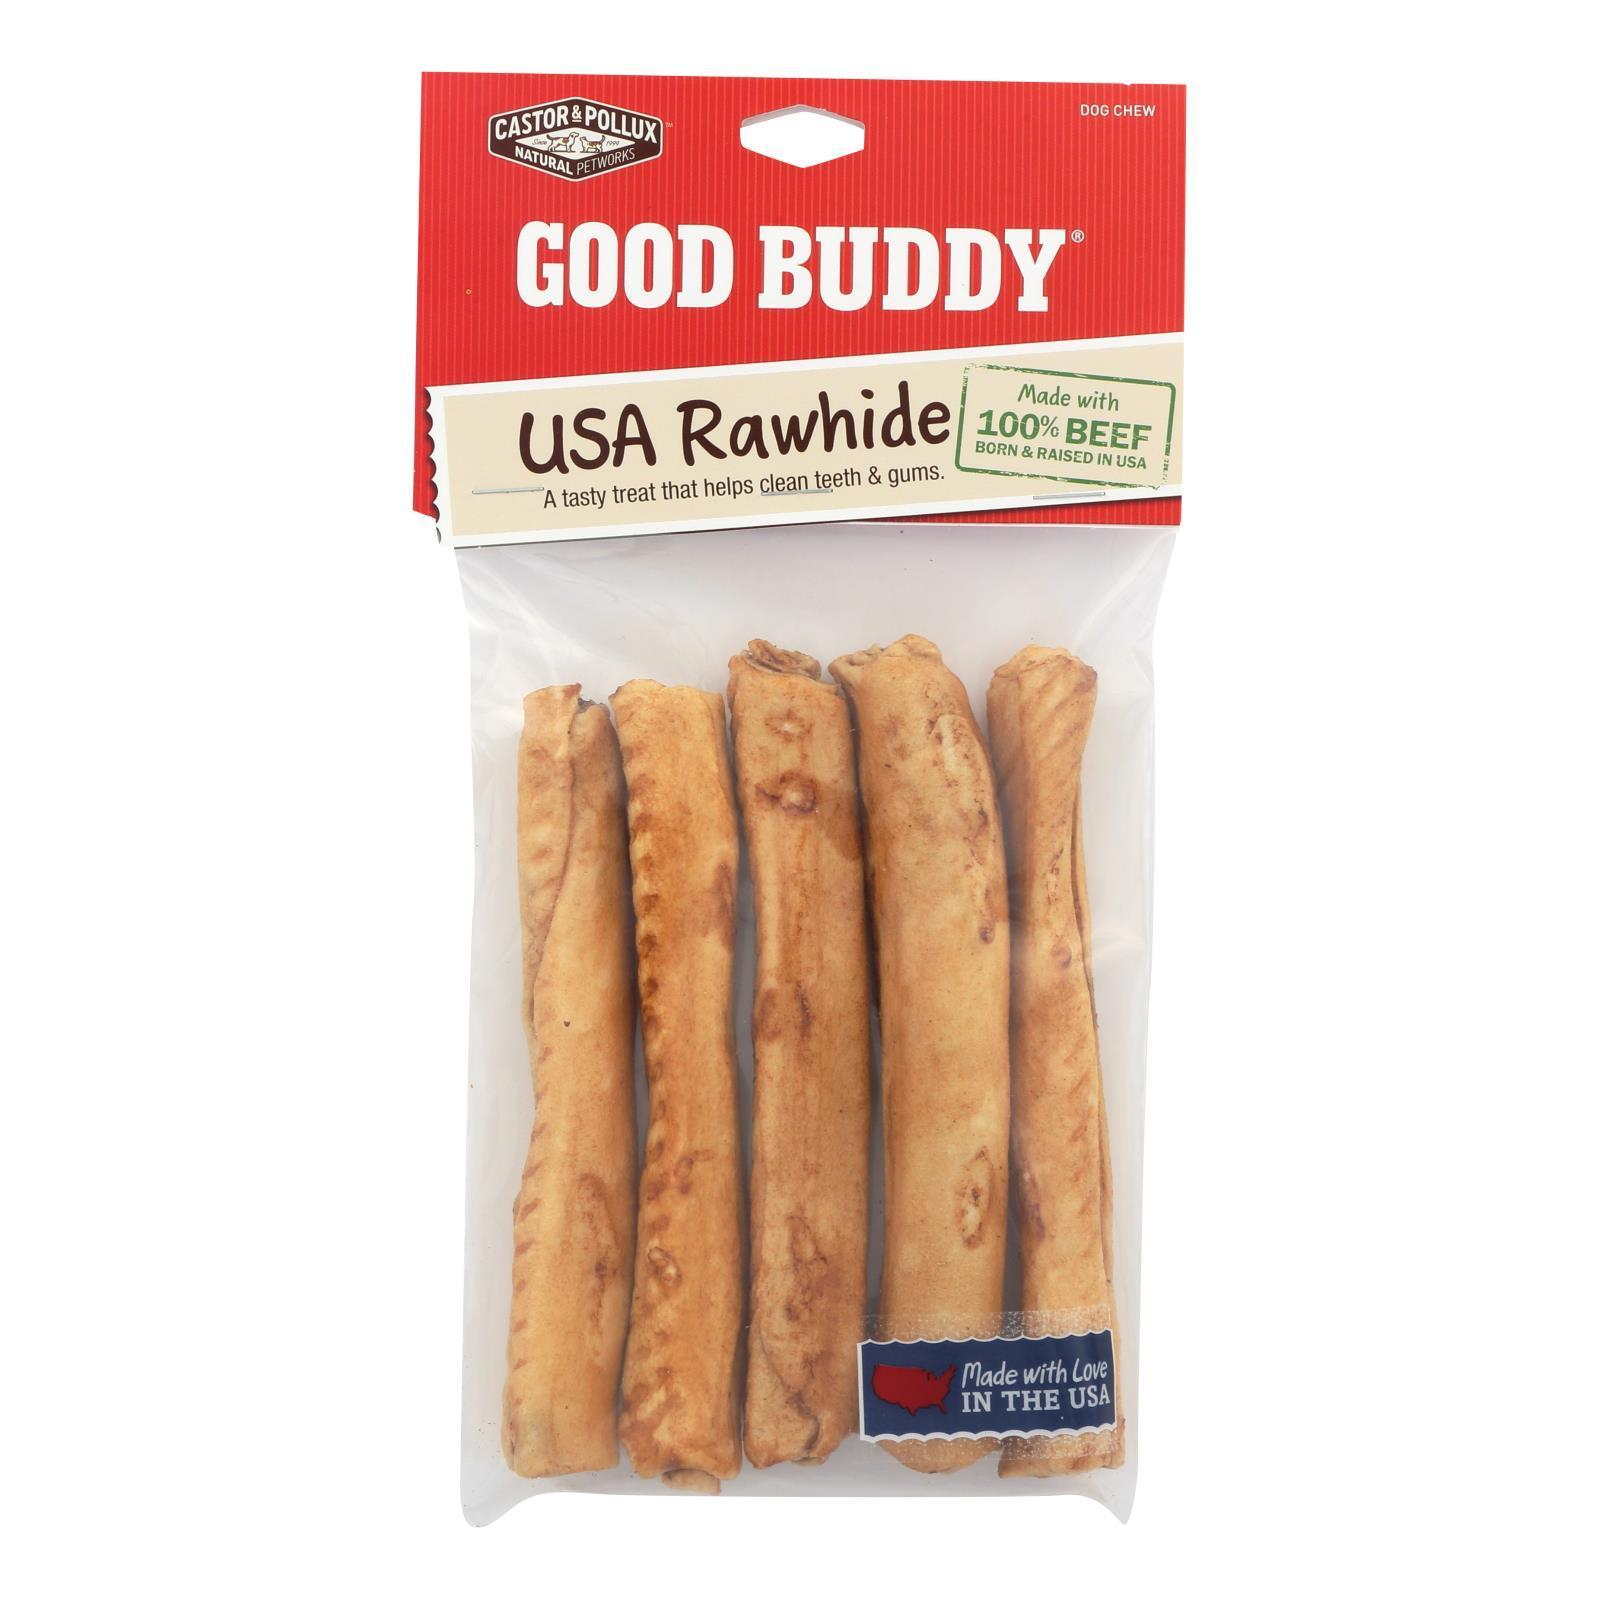 Castor and Pollux Good Buddy Sticks Rawhide Dog Chews - Case of 12